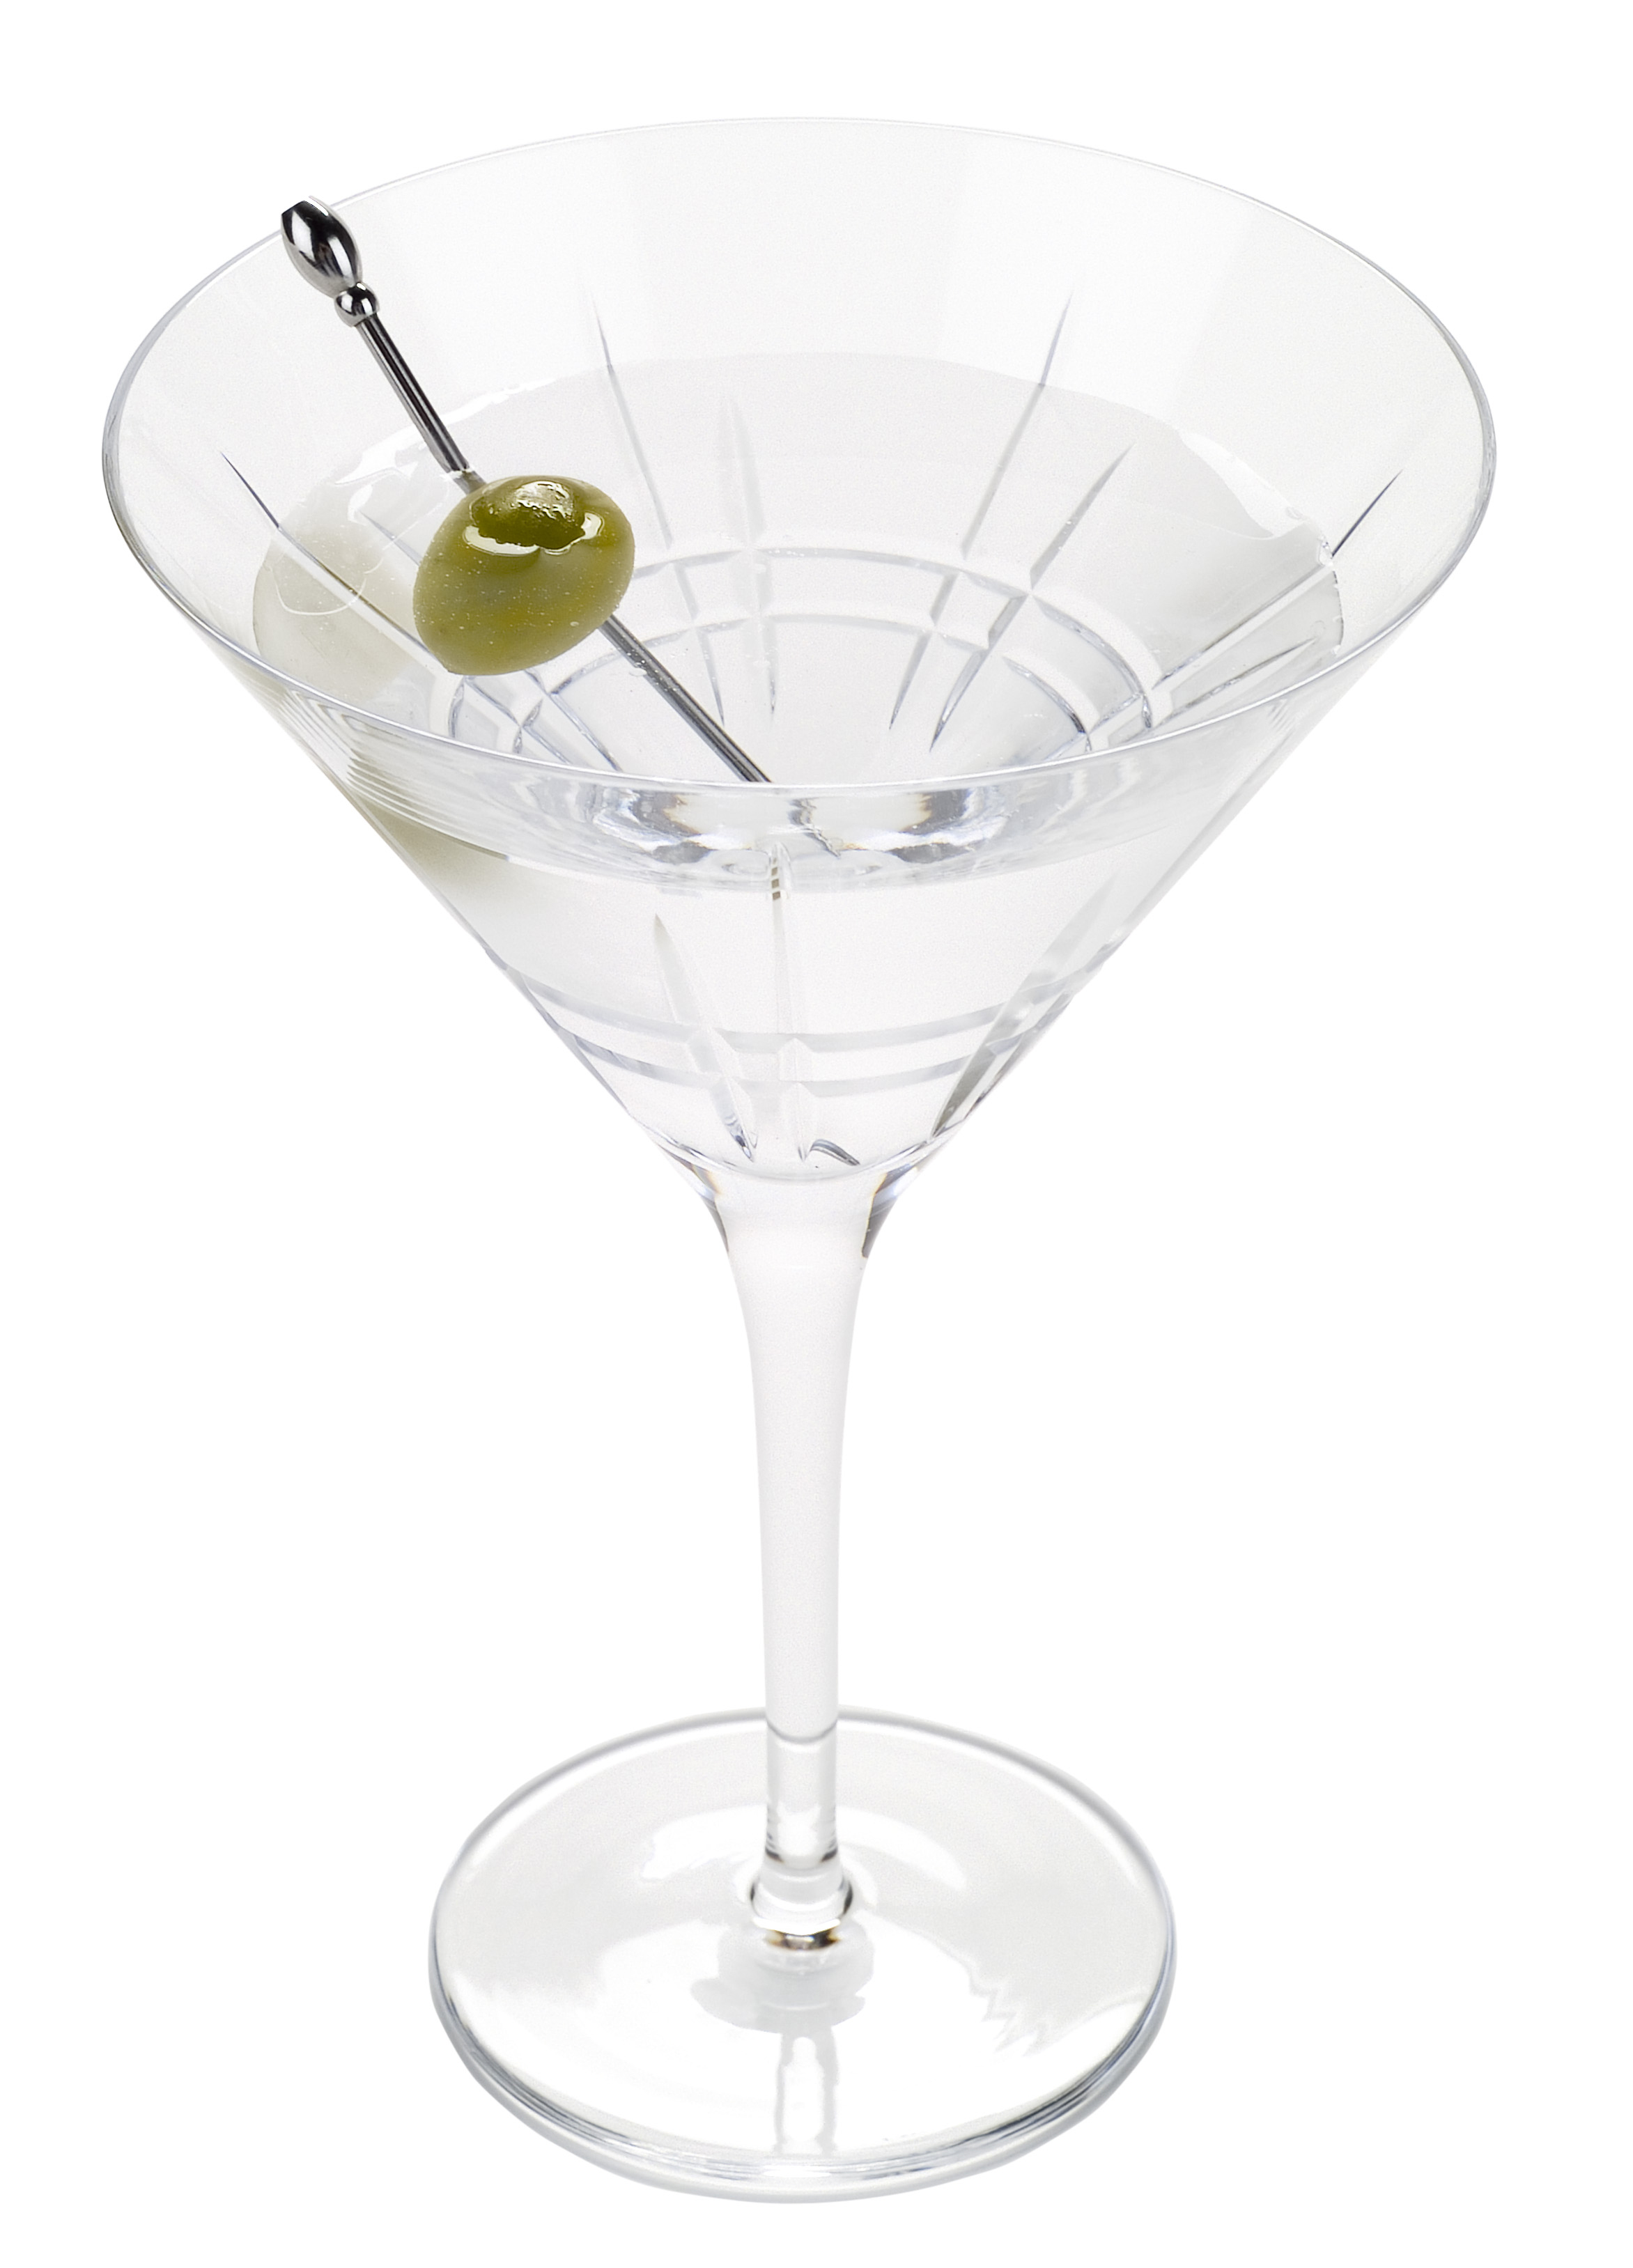 james bond drink